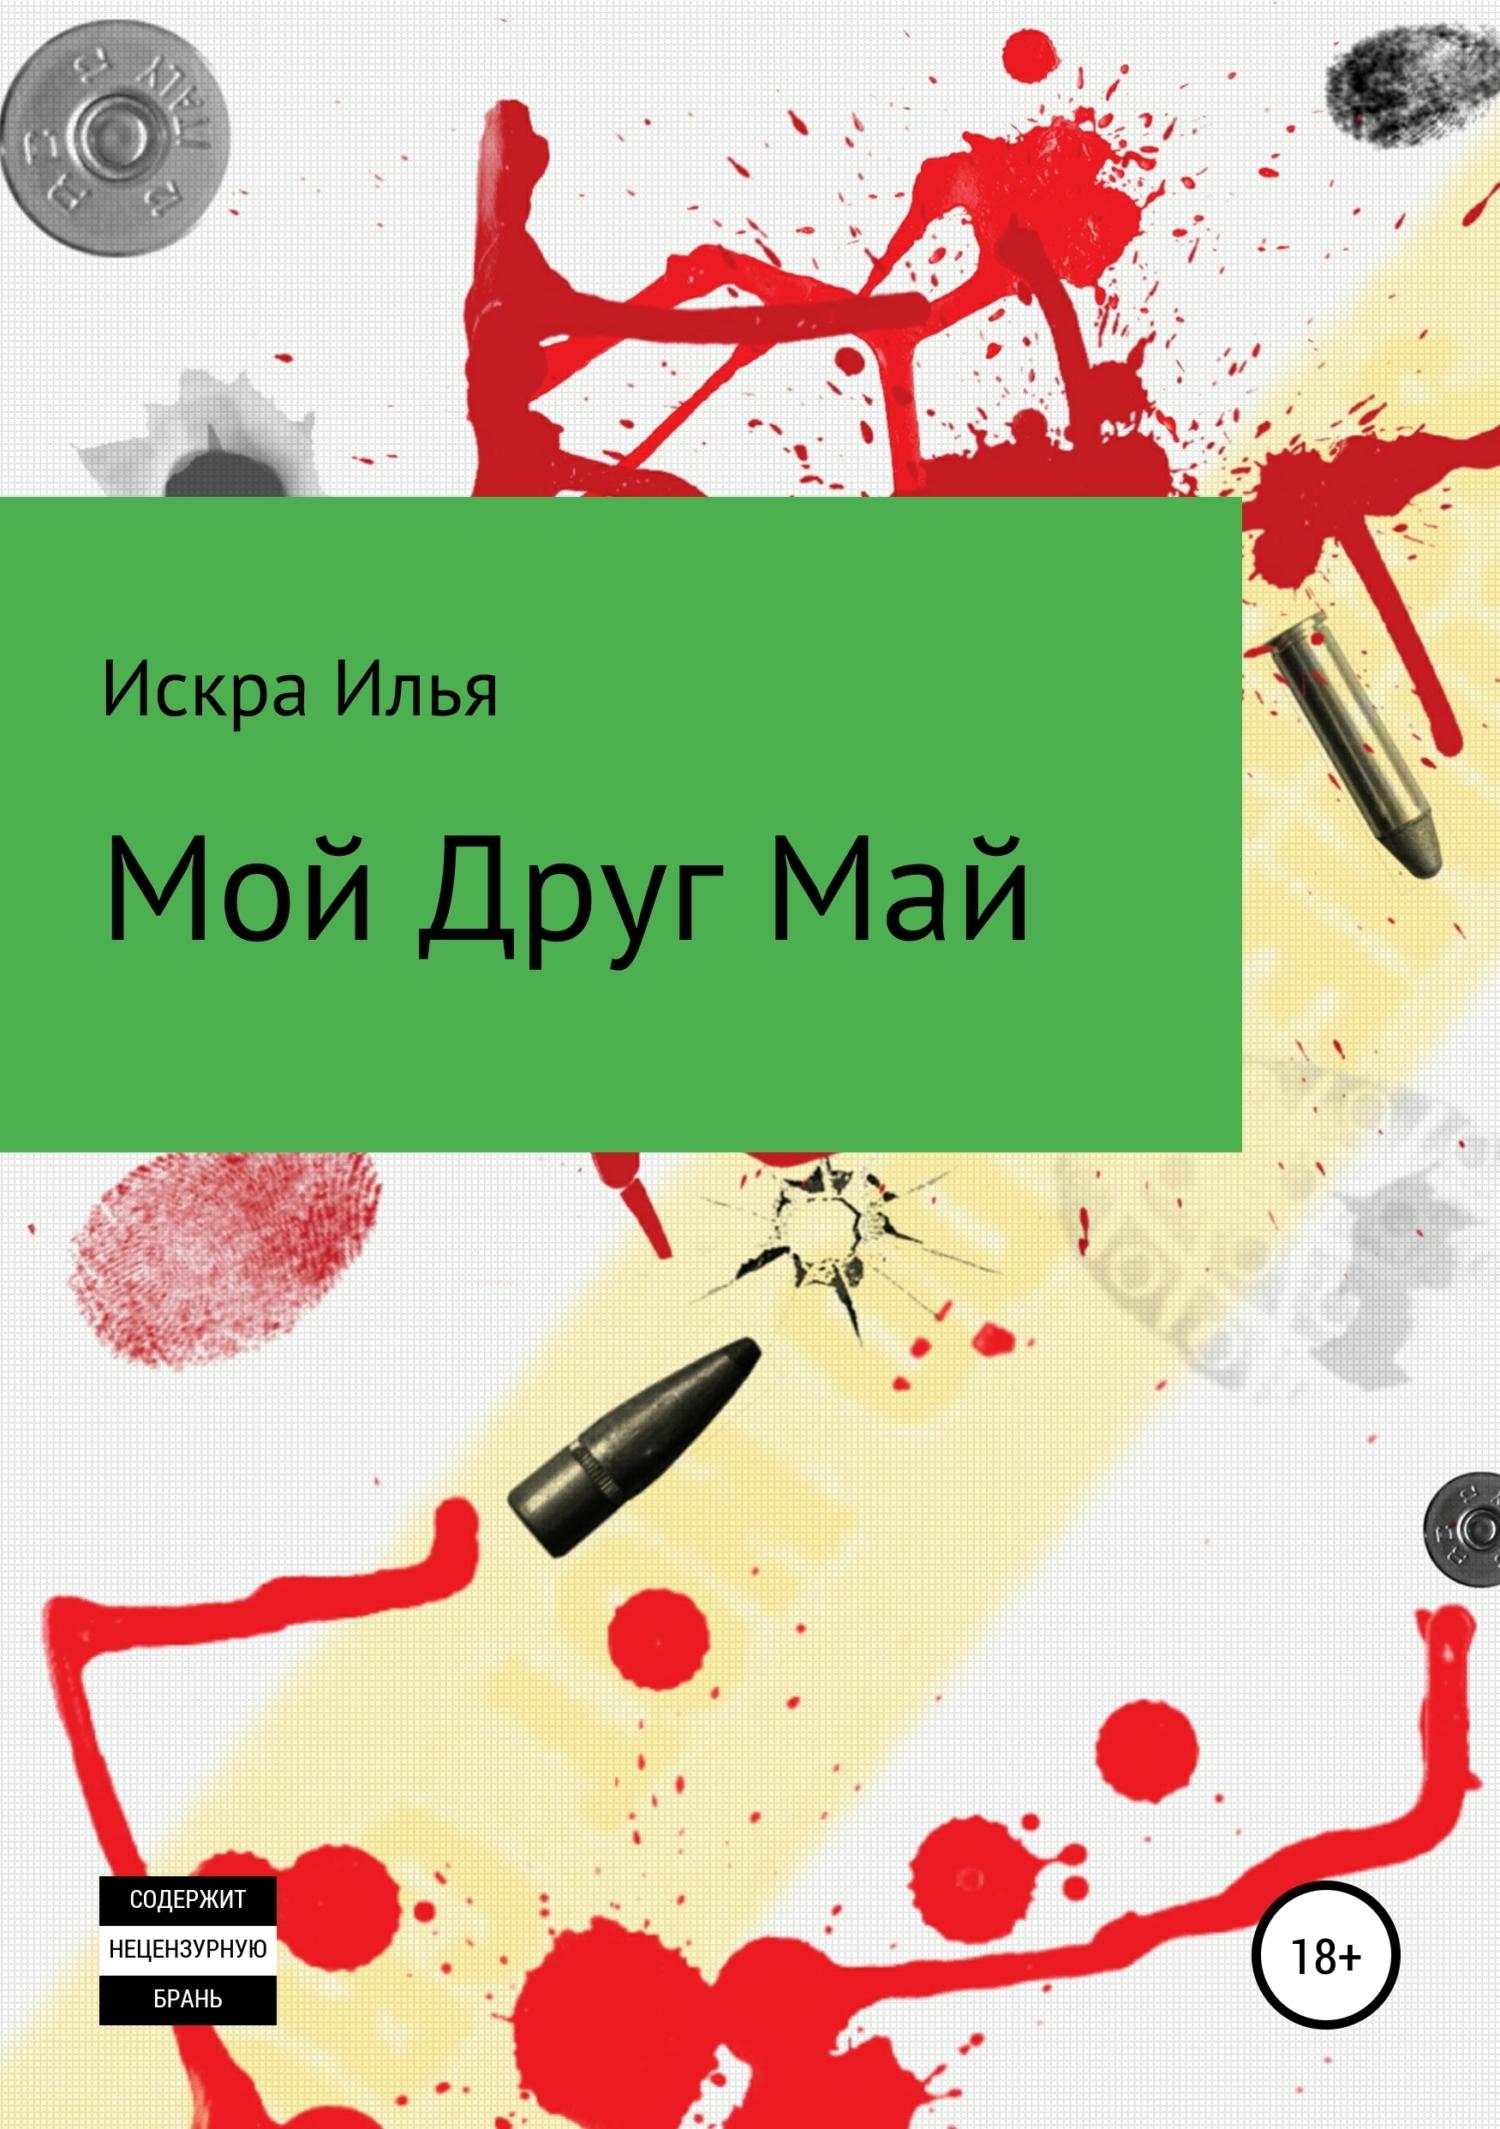 сайт май шоп